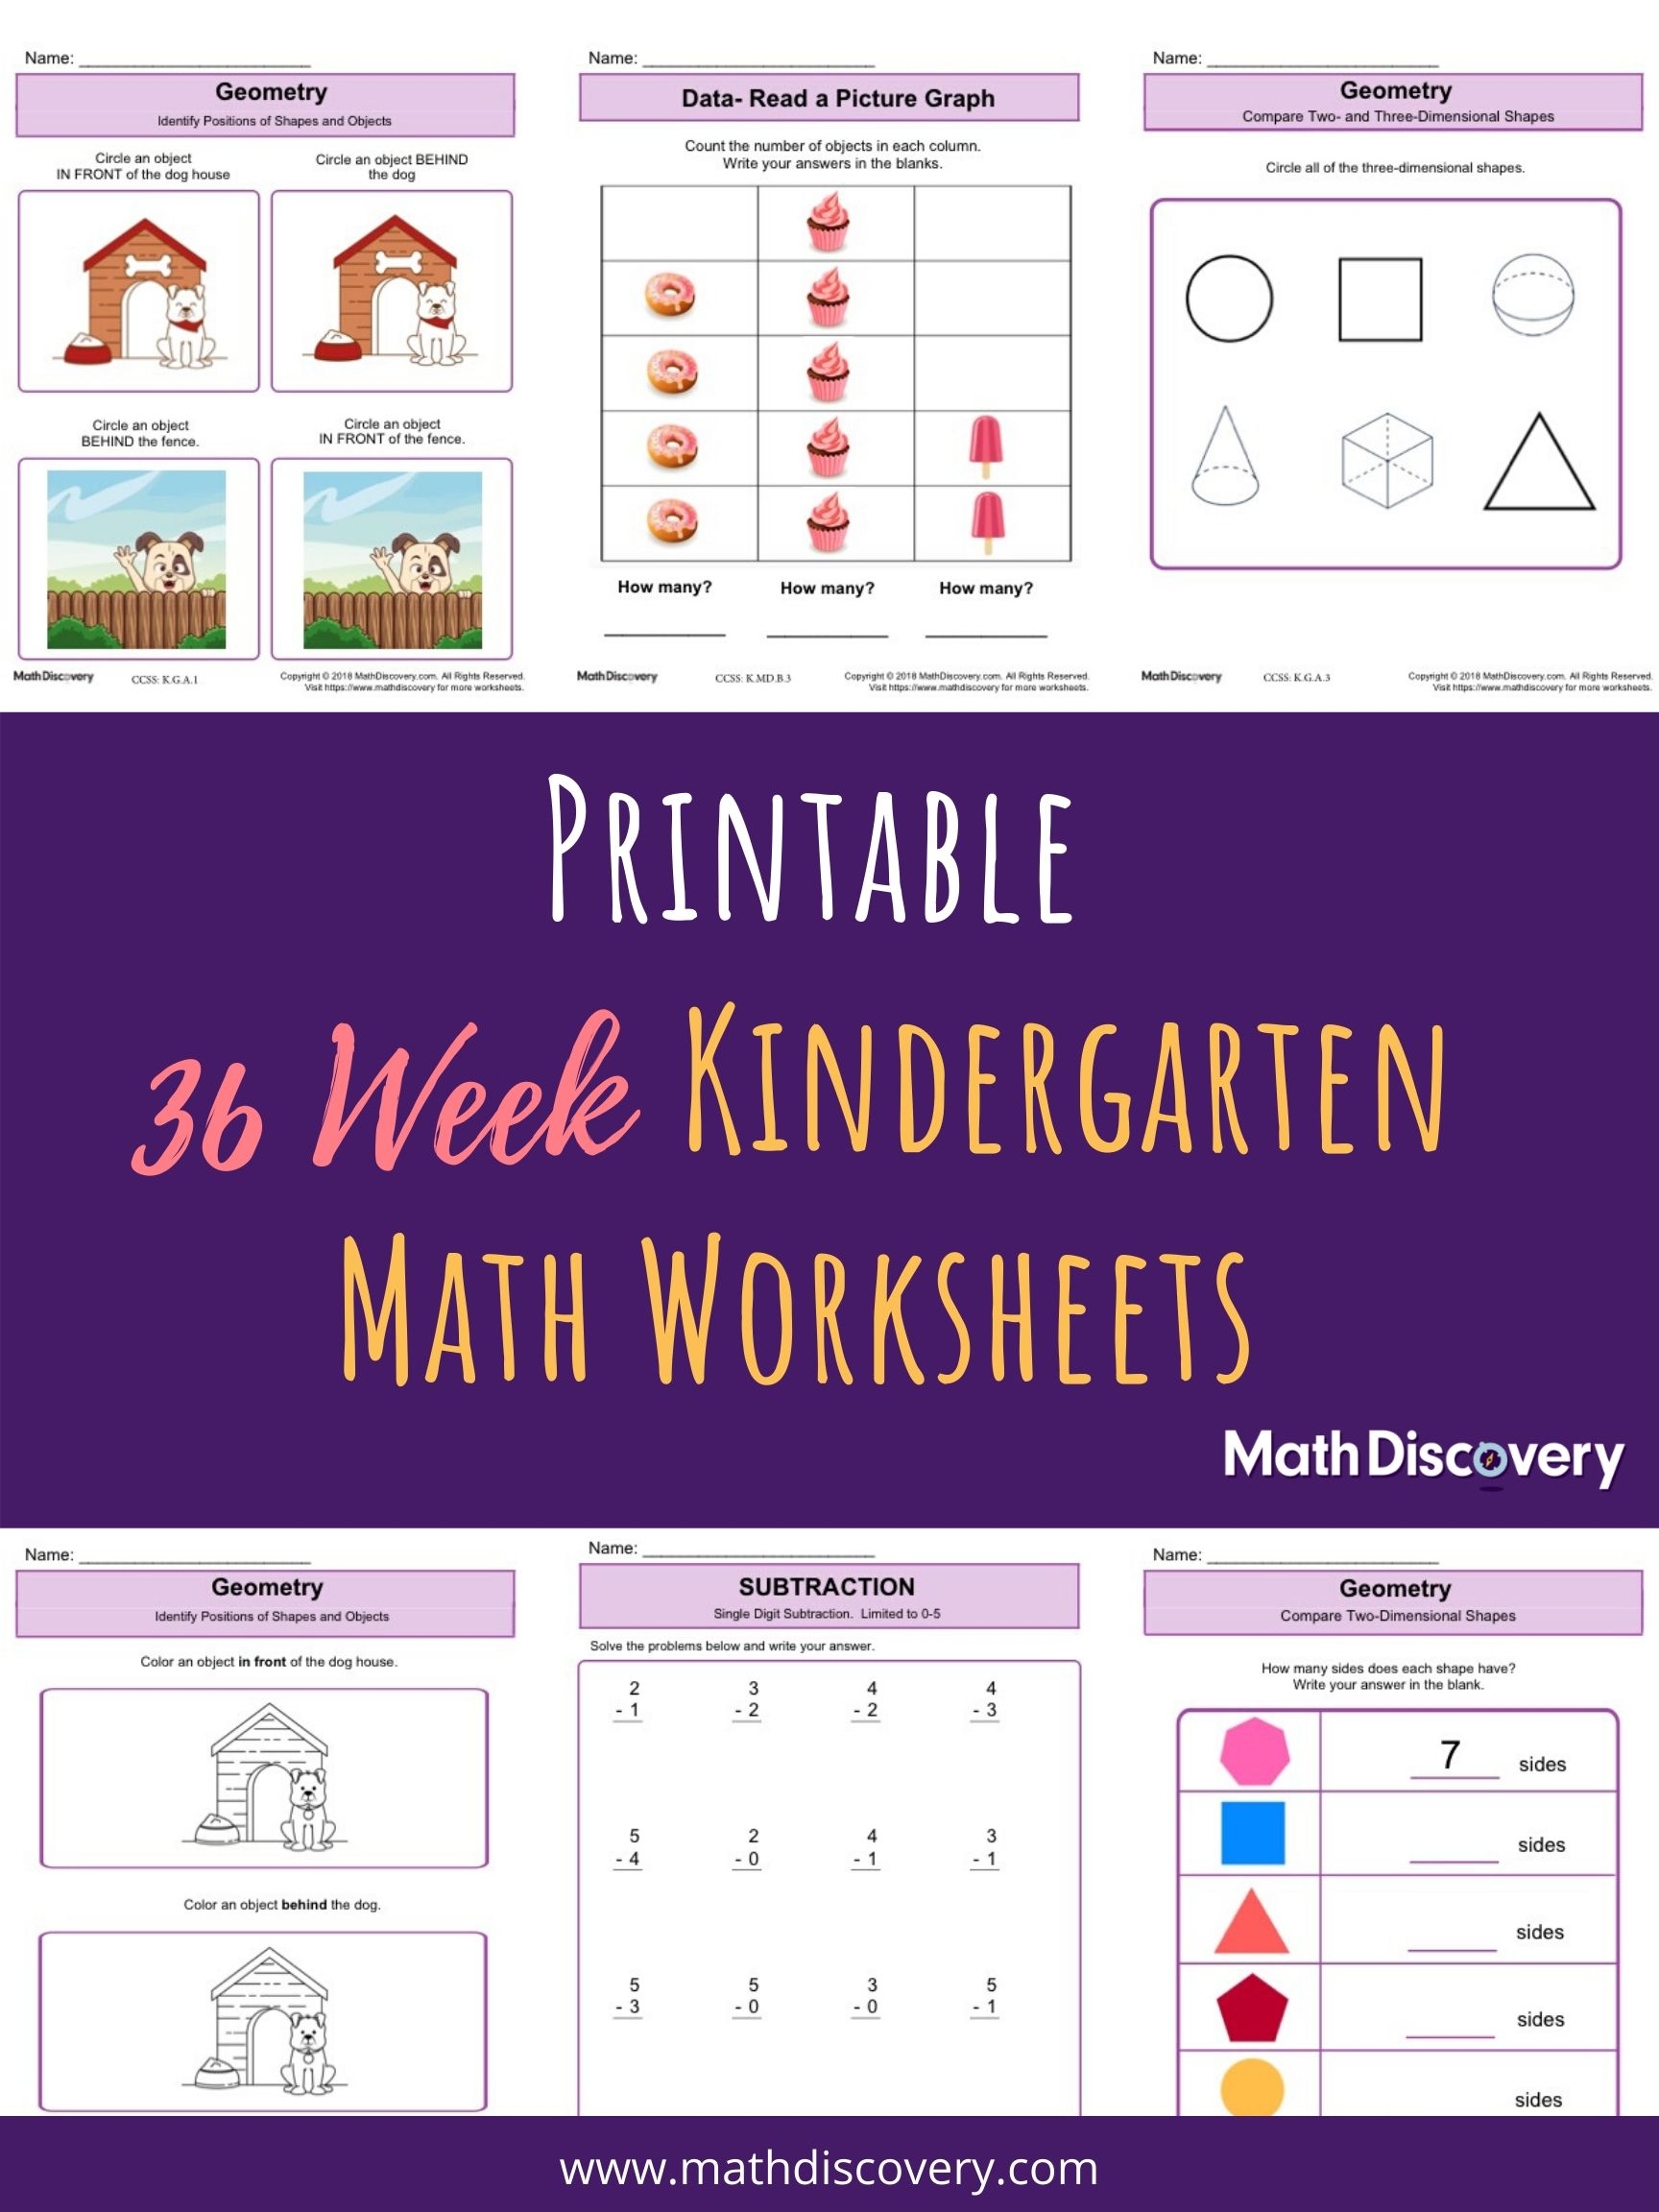 Weekly Kindergarten Math Lessons